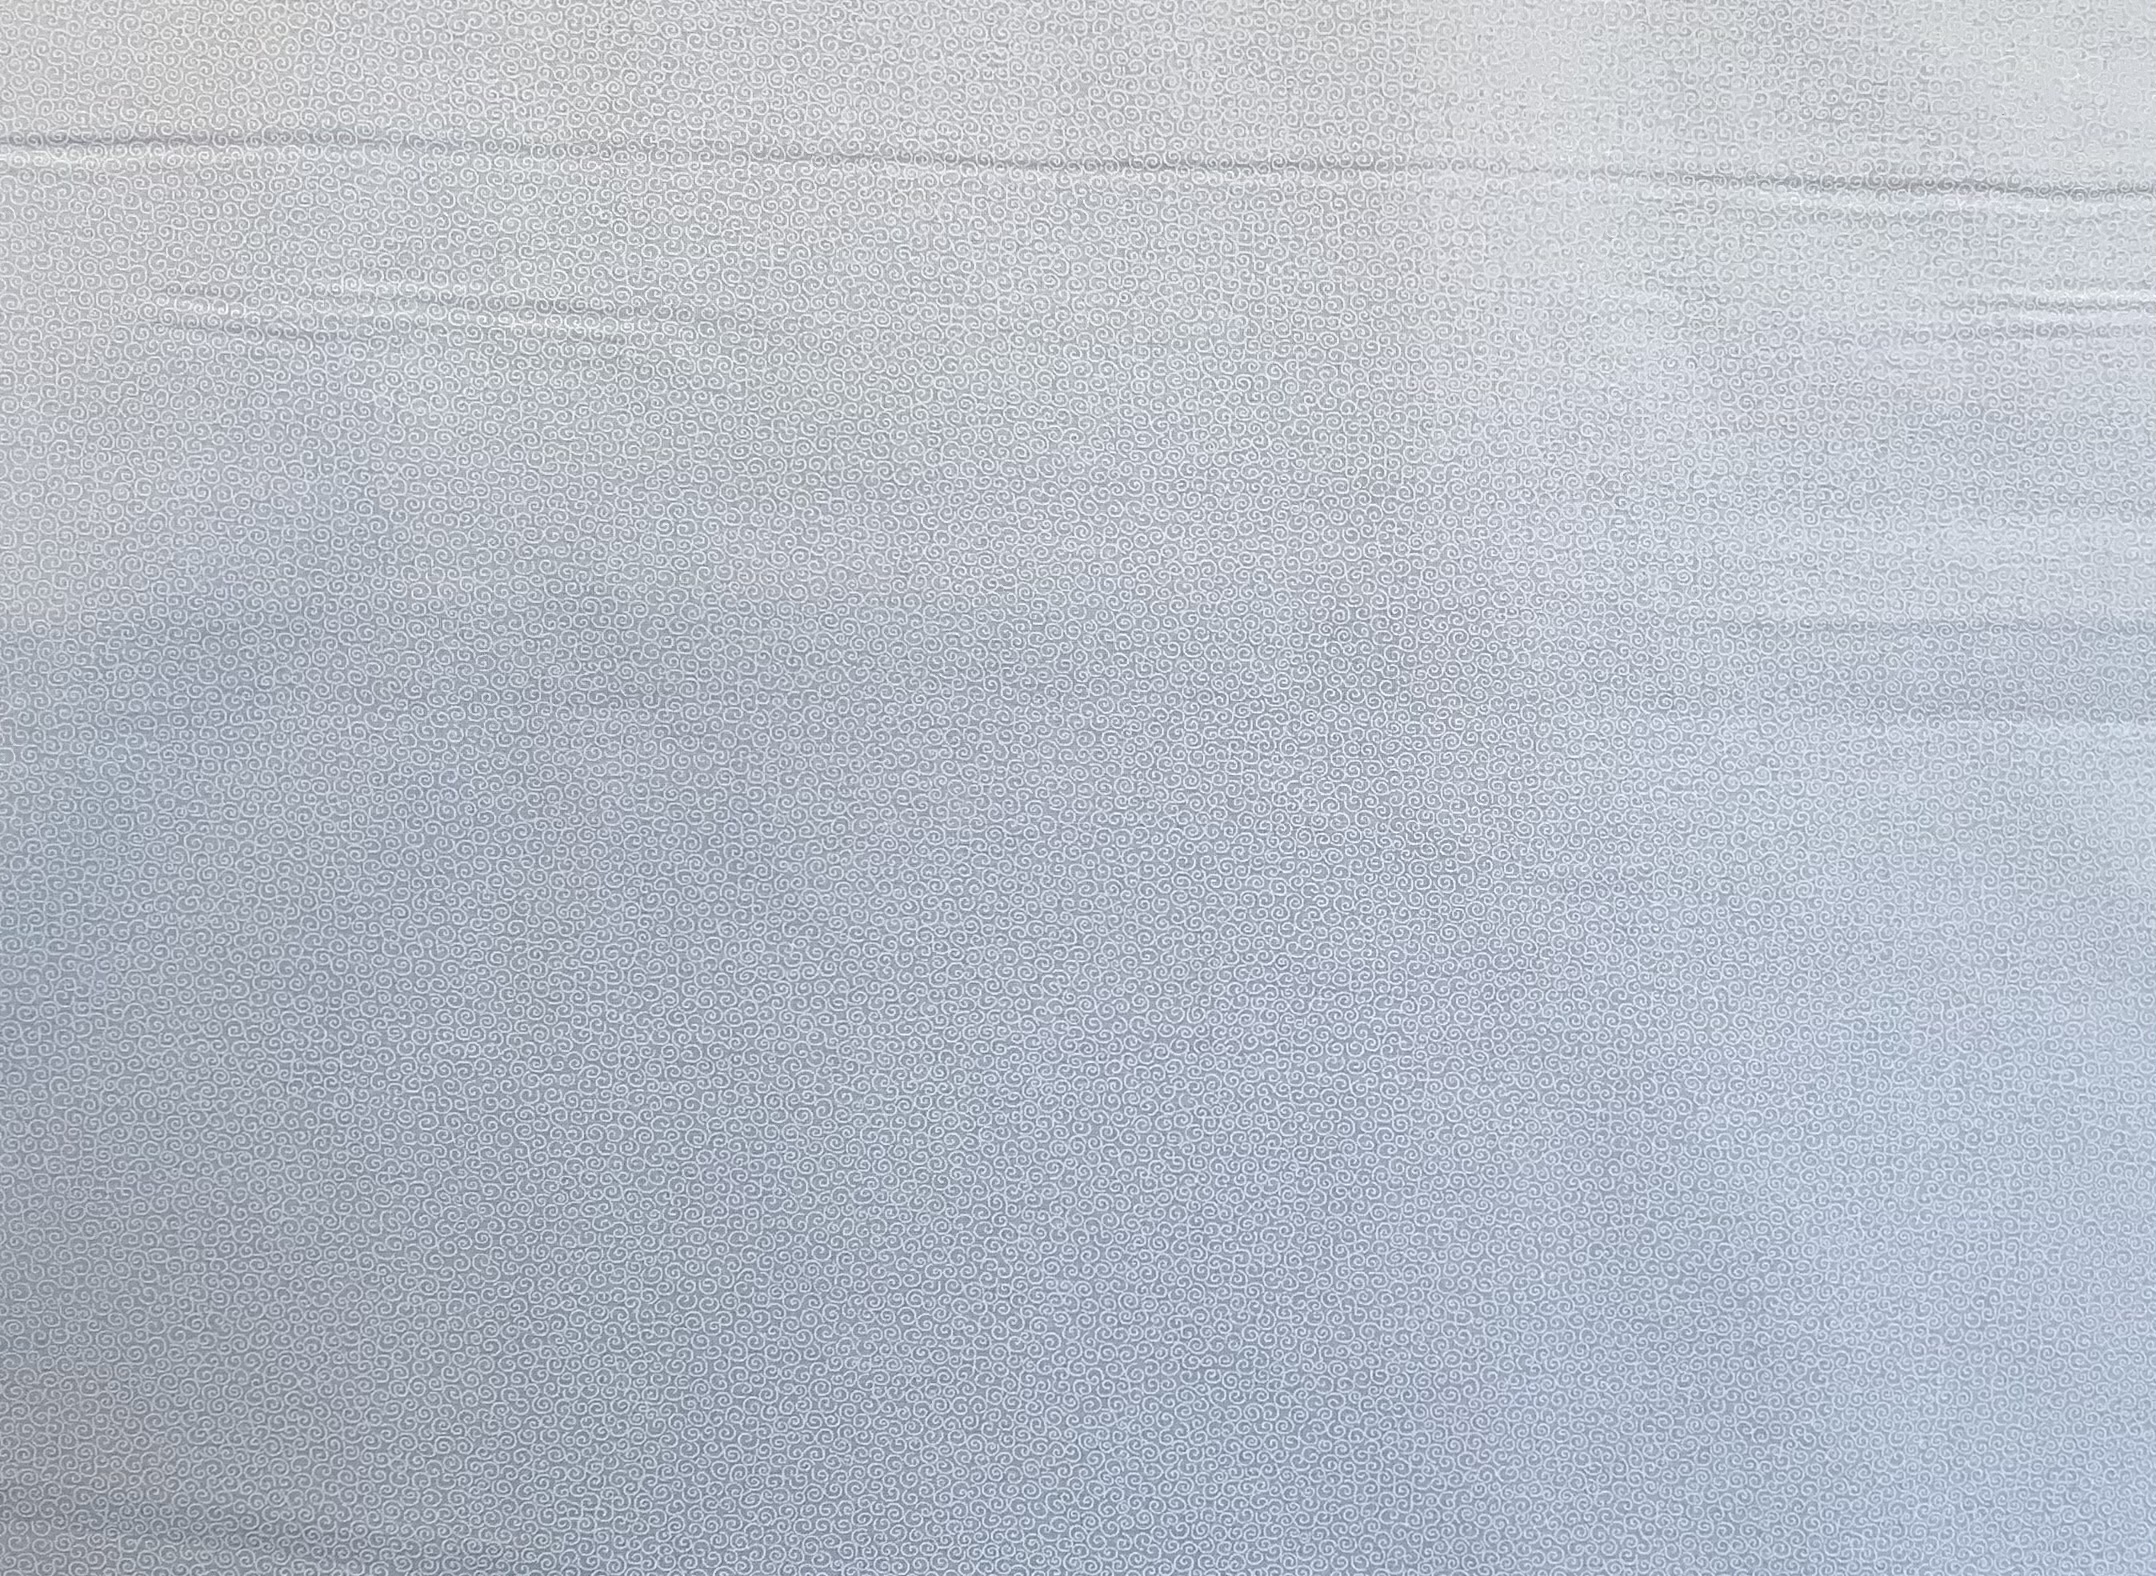 White Tone on Tone - Swirls - 1/2m cut 57716